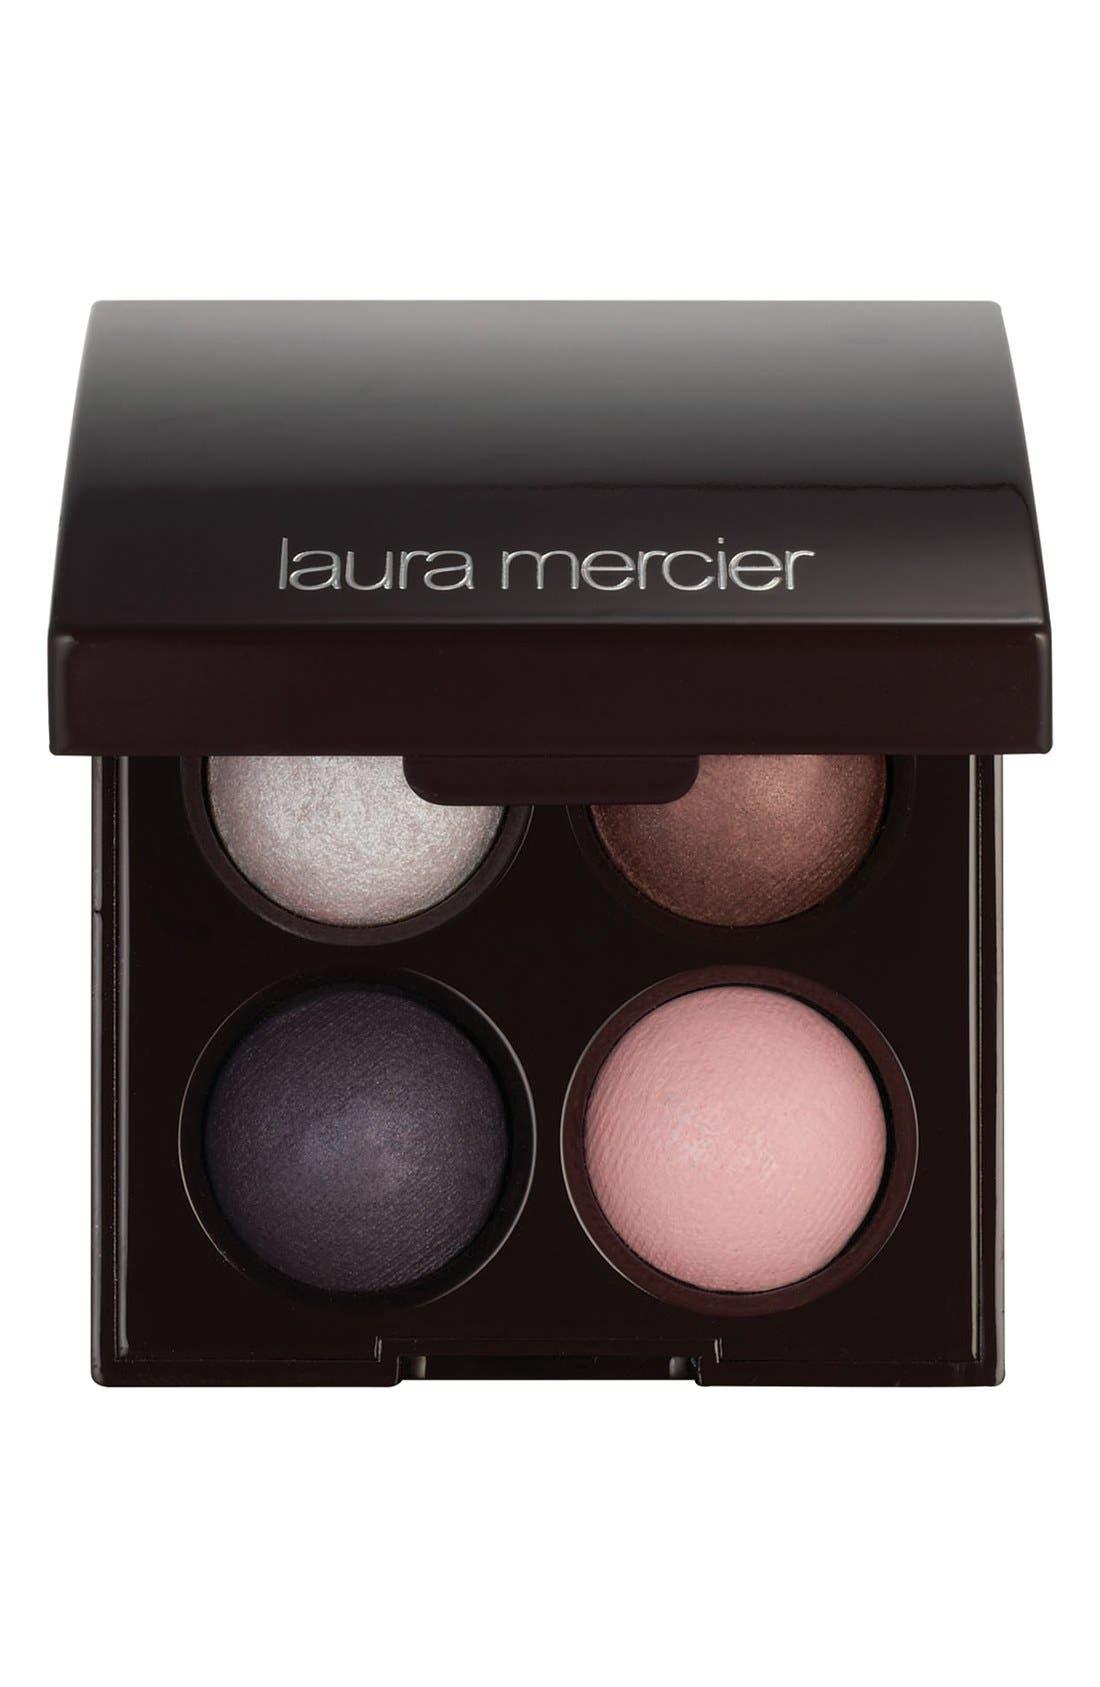 LAURA MERCIER Baked Eyeshadow Quad, Main, color, 960